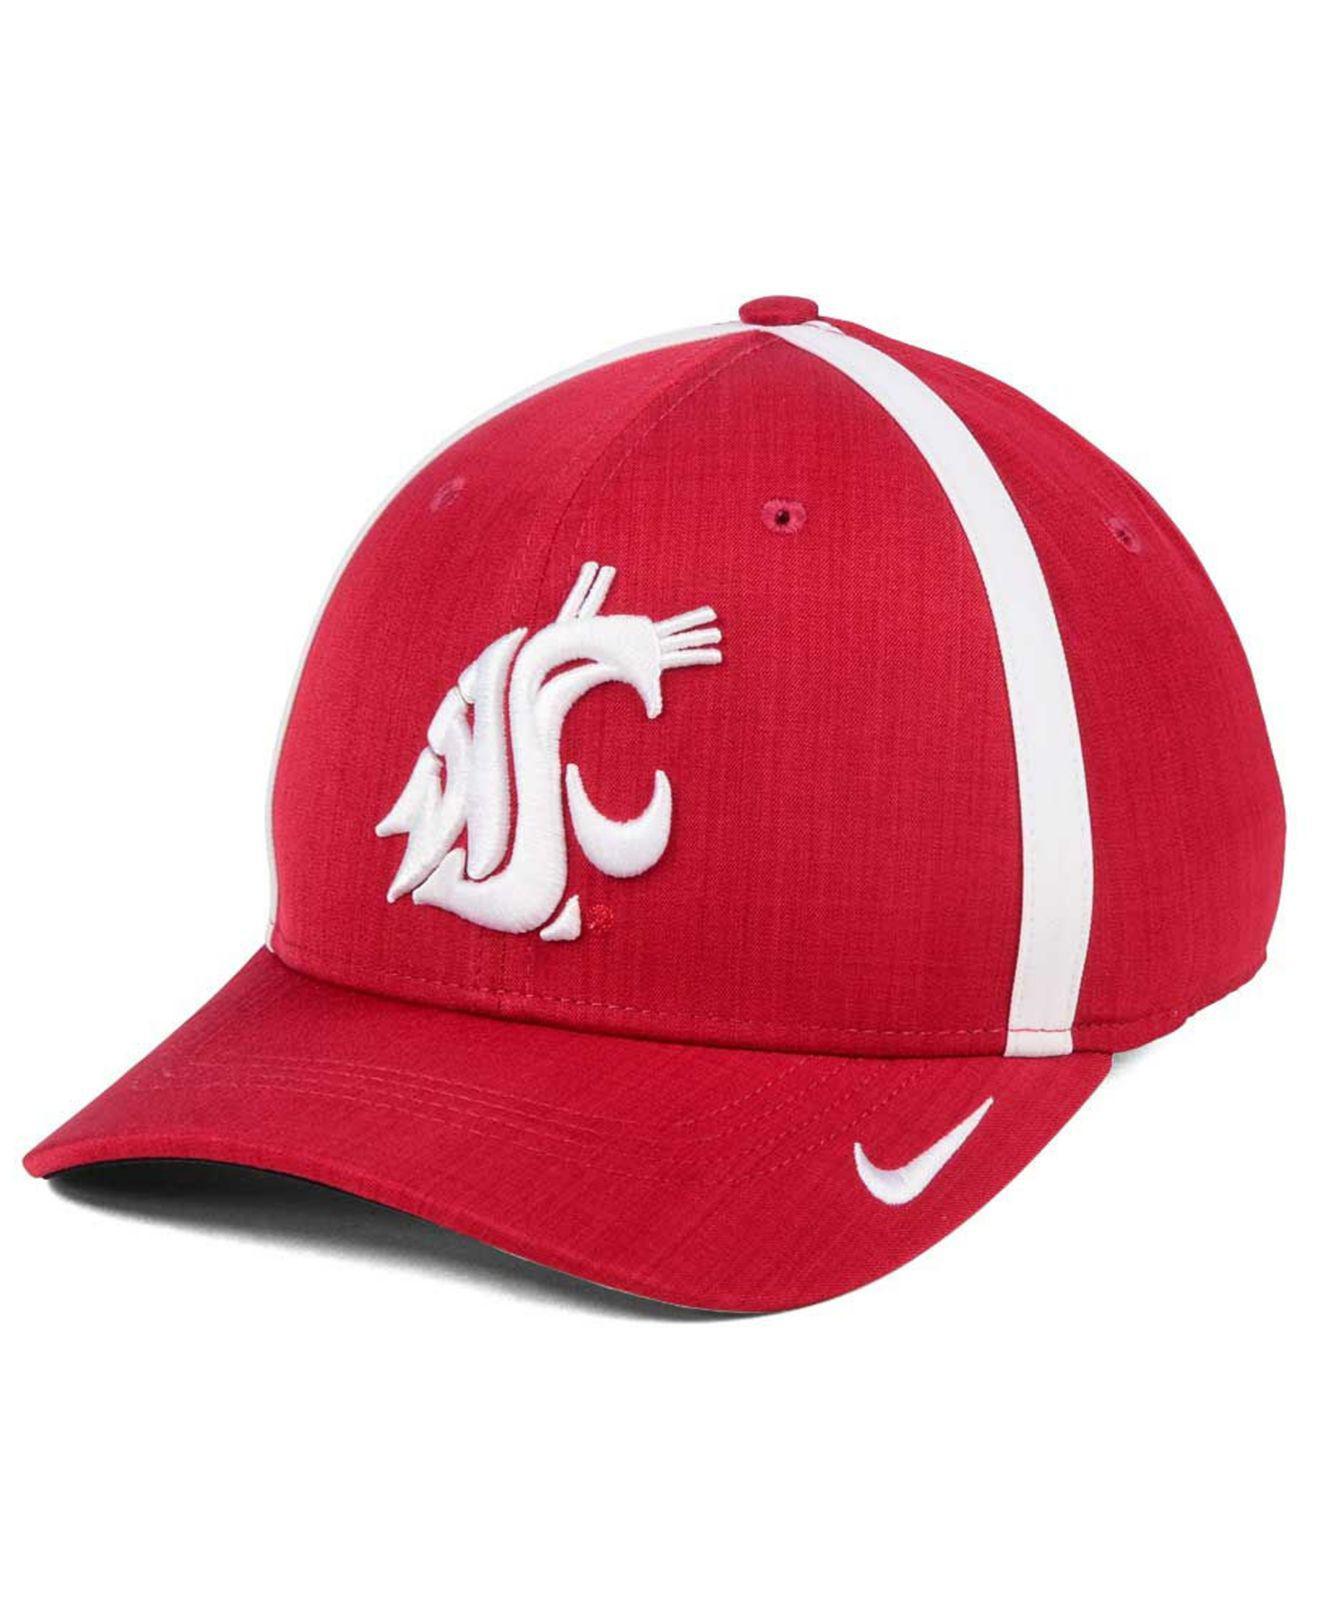 b8ad1152115c57 Lyst - Nike Aerobill Classic Sideline Swoosh Flex Cap in Red for Men